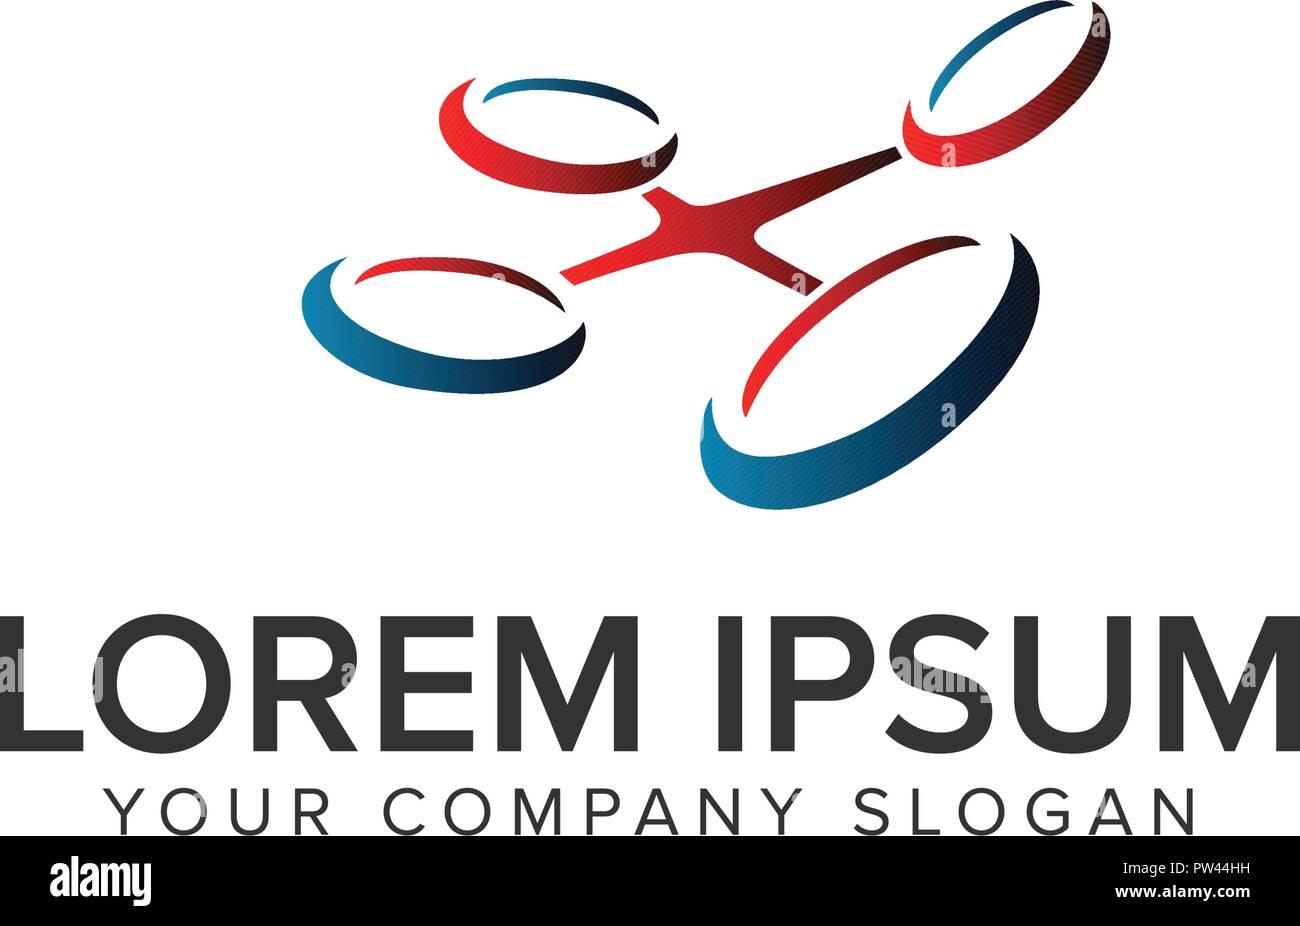 drone logo design concept template. fully editable vector - Stock Image